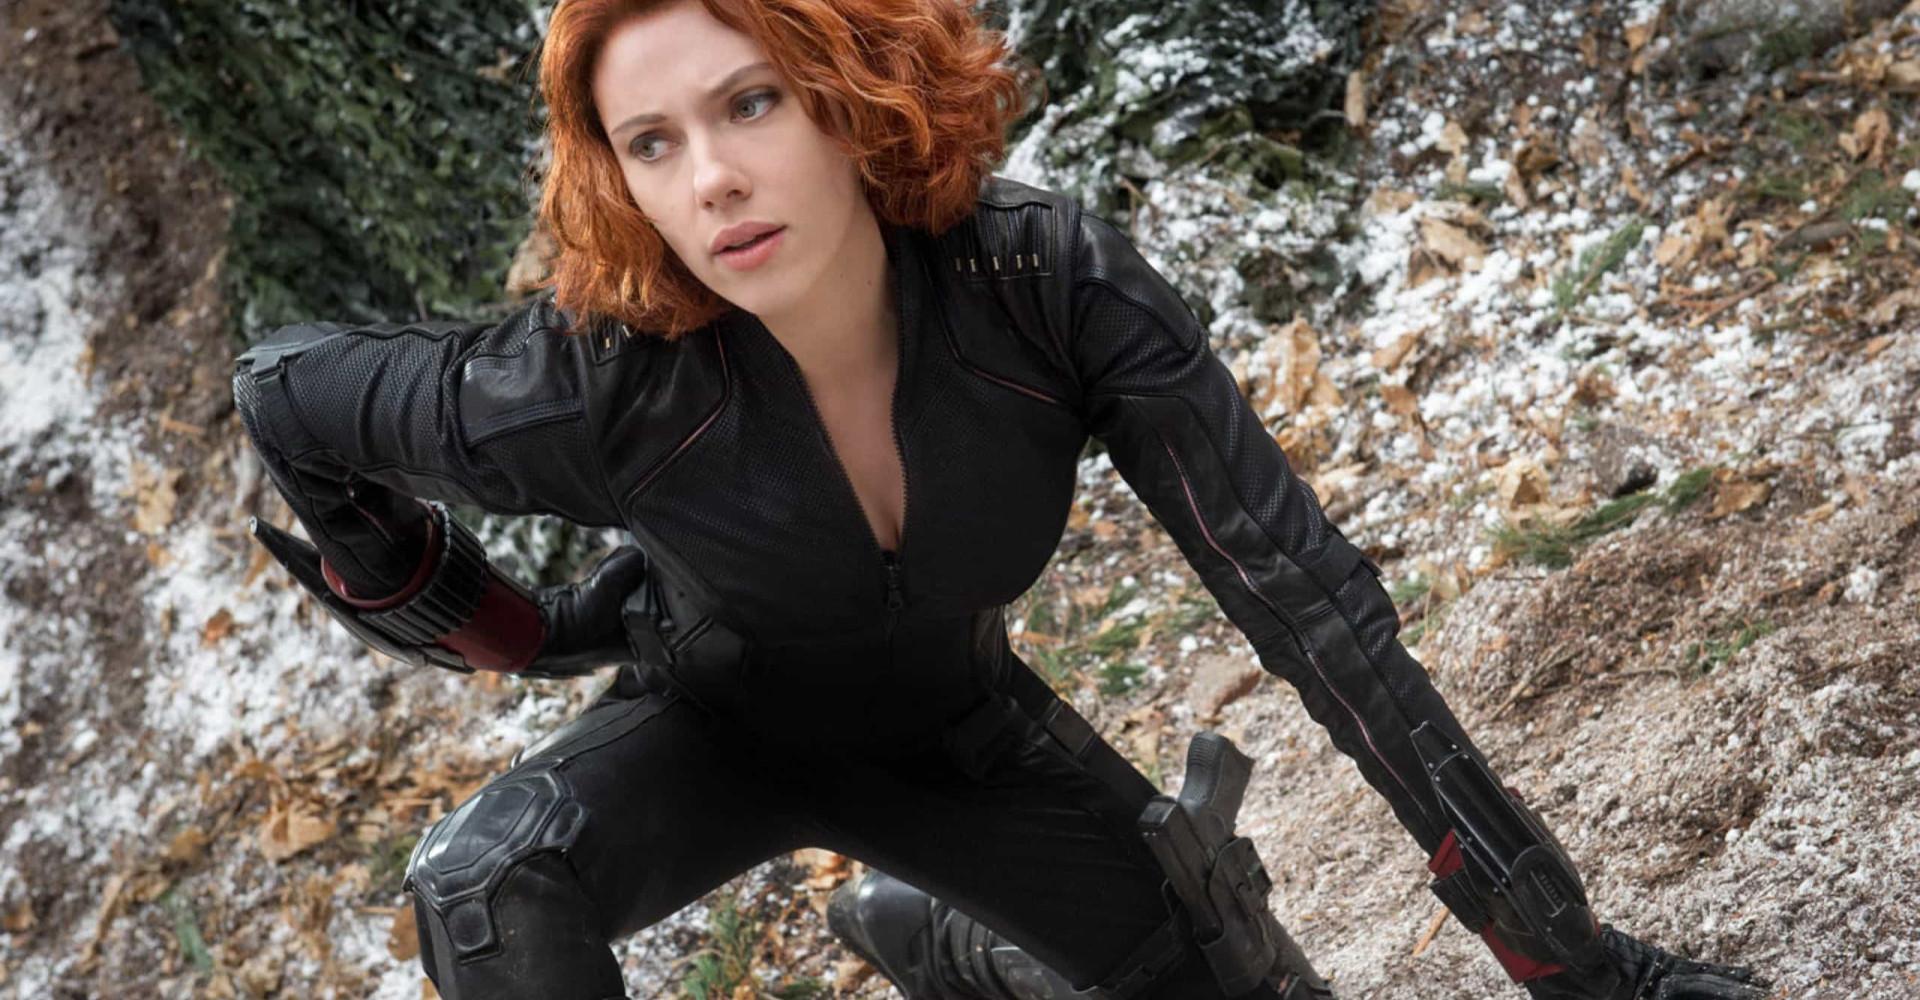 'Black Widow' marvels: A look at the MCU, so far